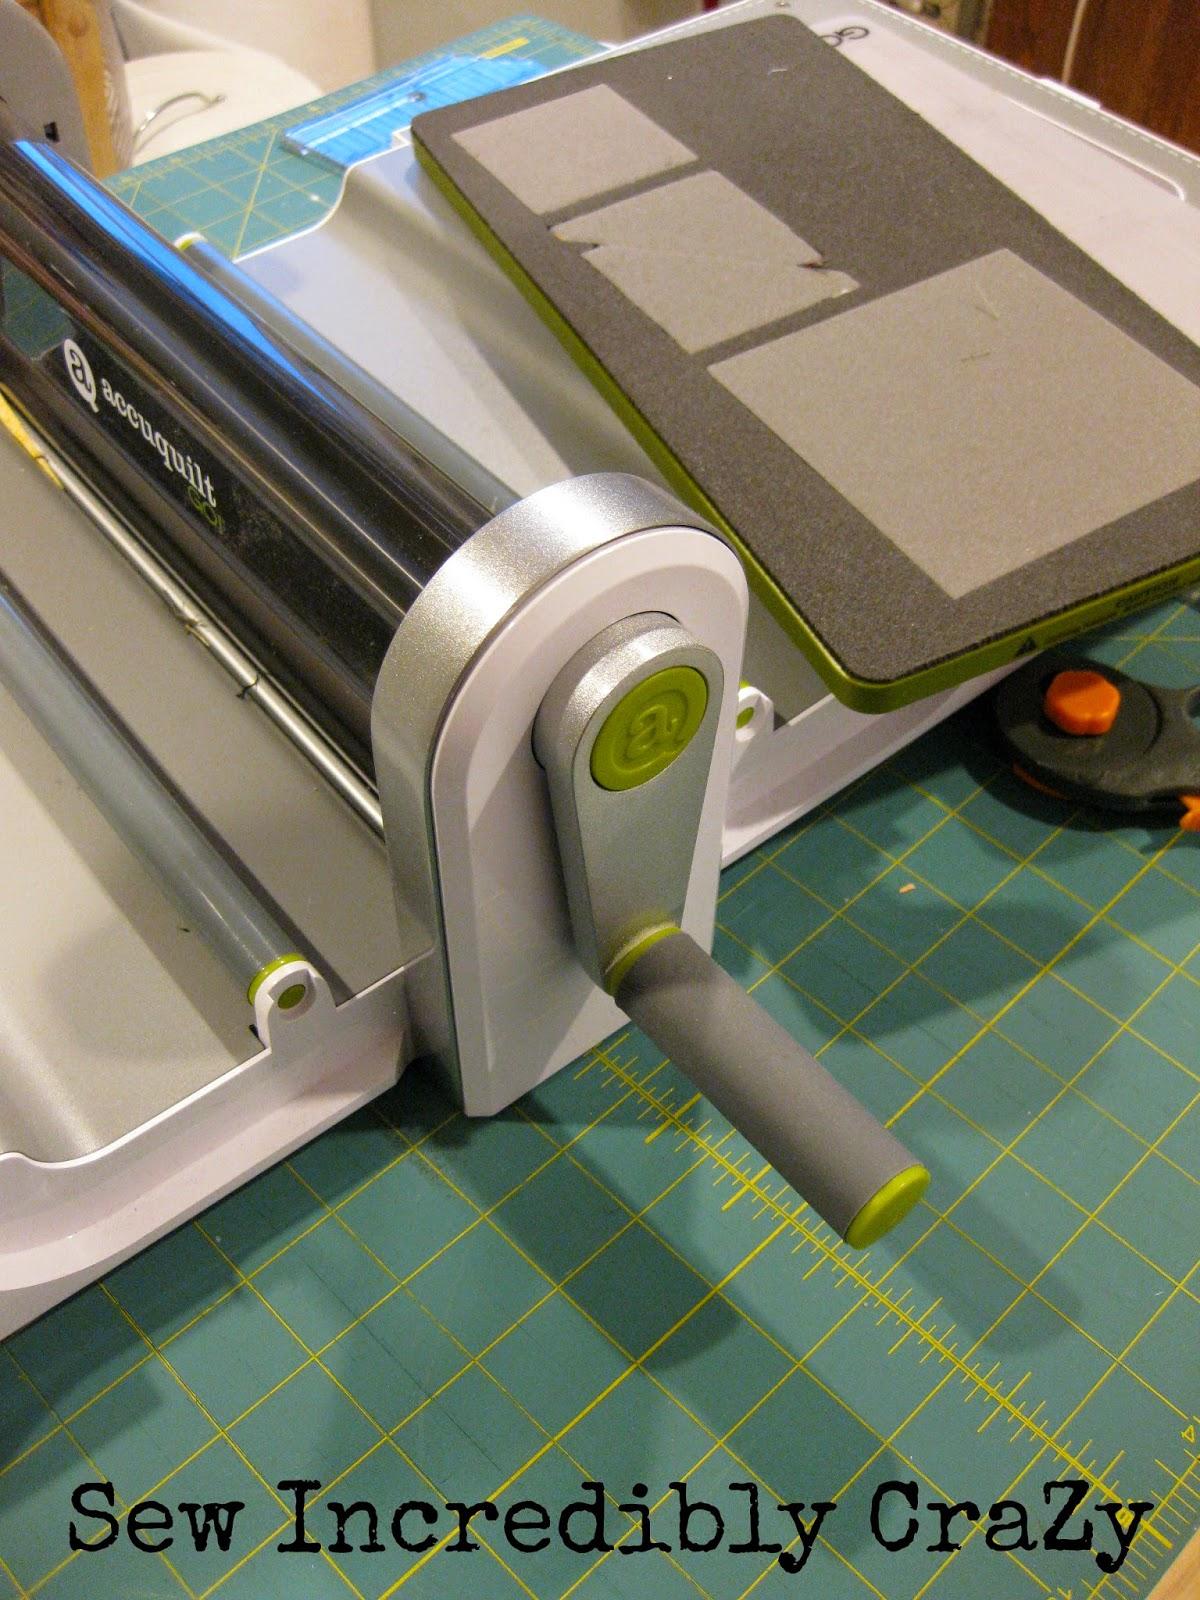 "<a href=""http://www.shareasale.com/r.cfm?b=587582&u=769590&m=50439&urllink=&afftrack="">GO! Fabric Cutter</a>"